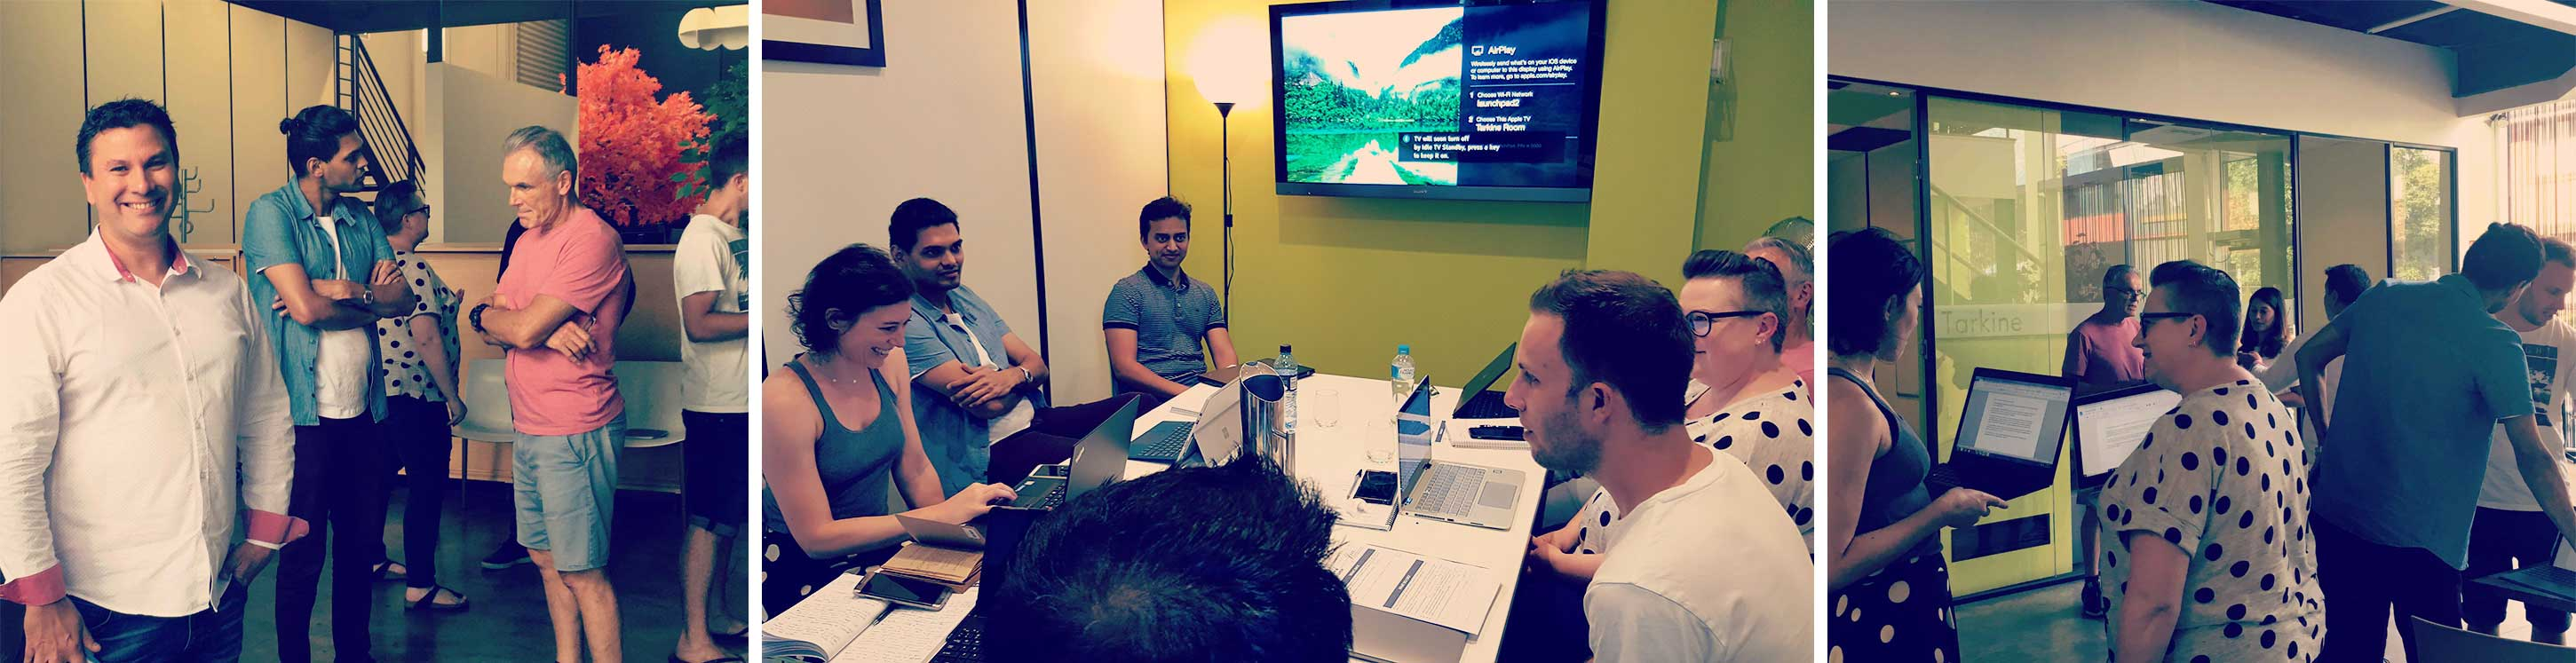 Job Application and Personal Branding Workshop